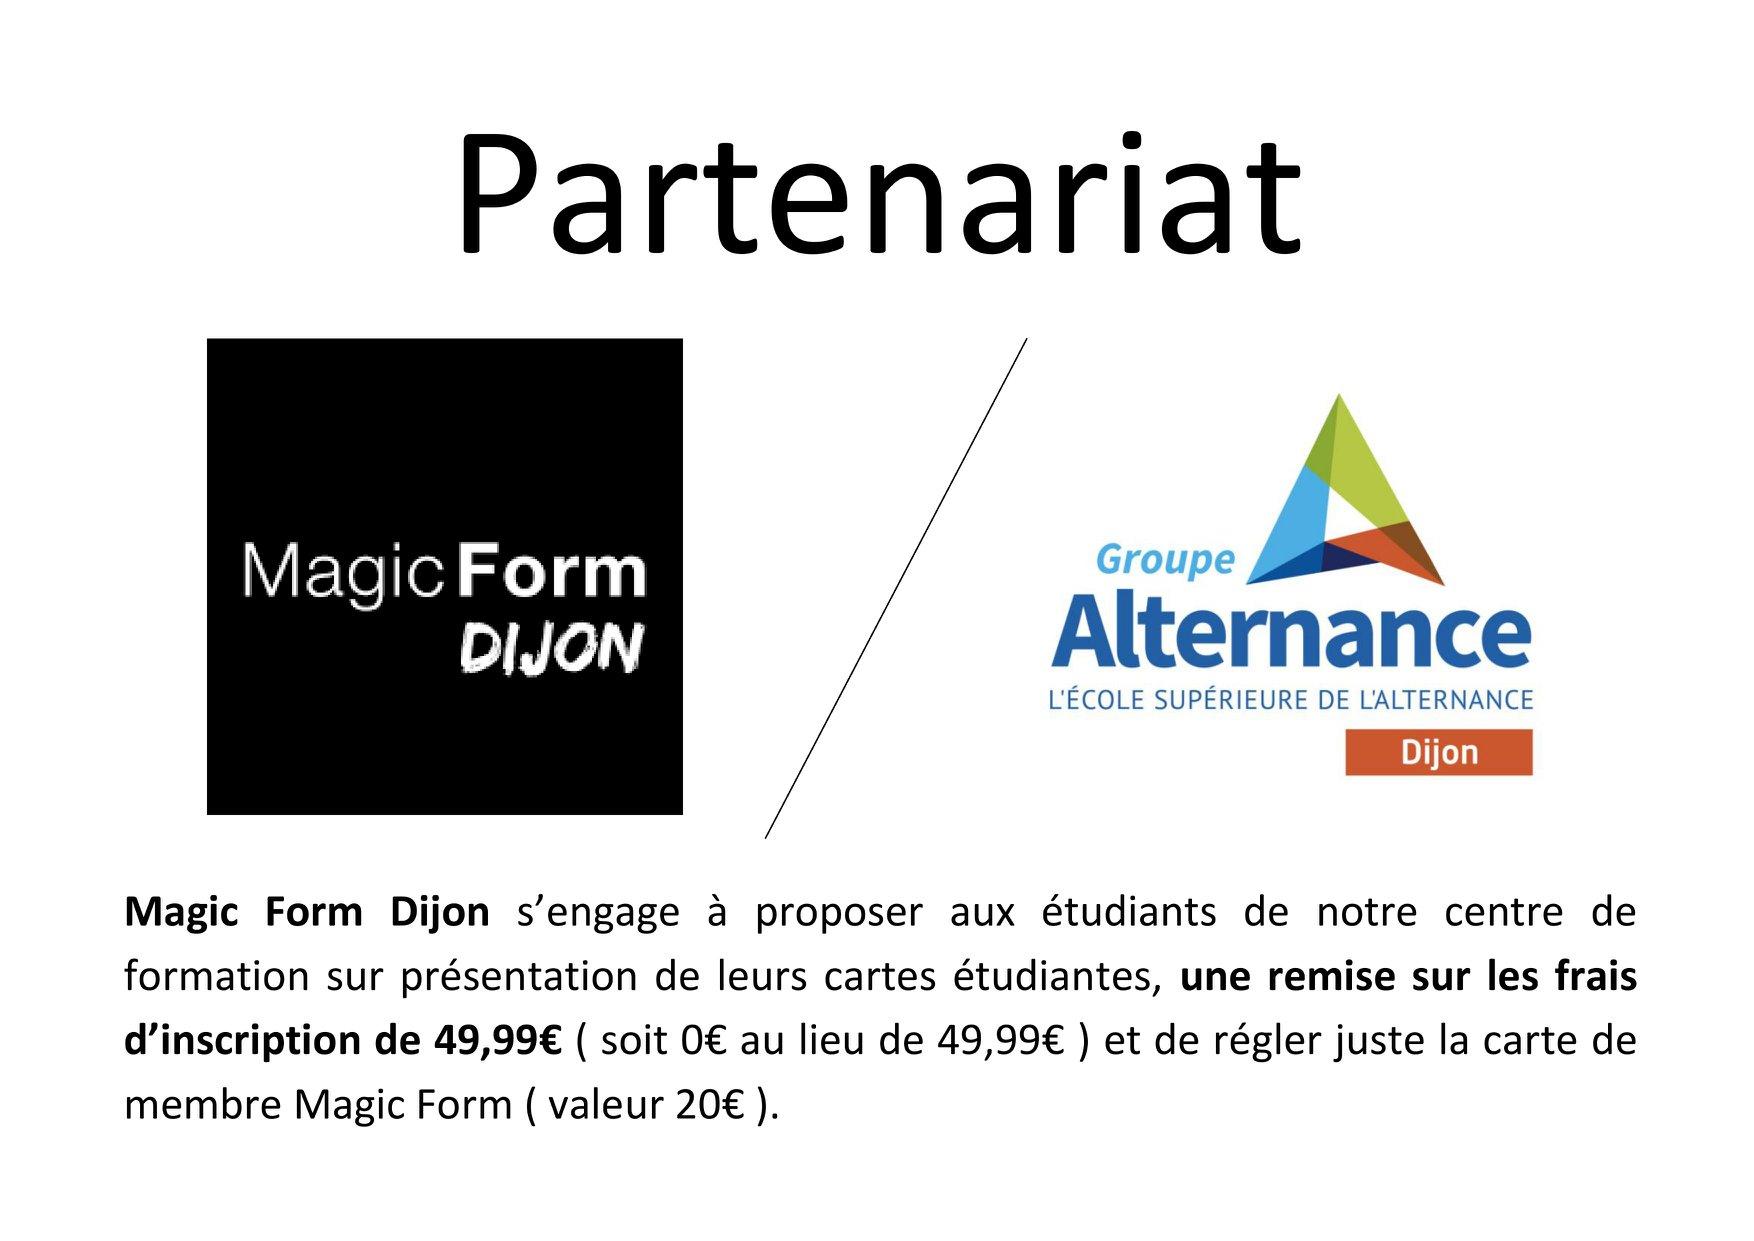 Partenariat Magic Form Dijon Groupe Alternance Etudiant Sport Fitness